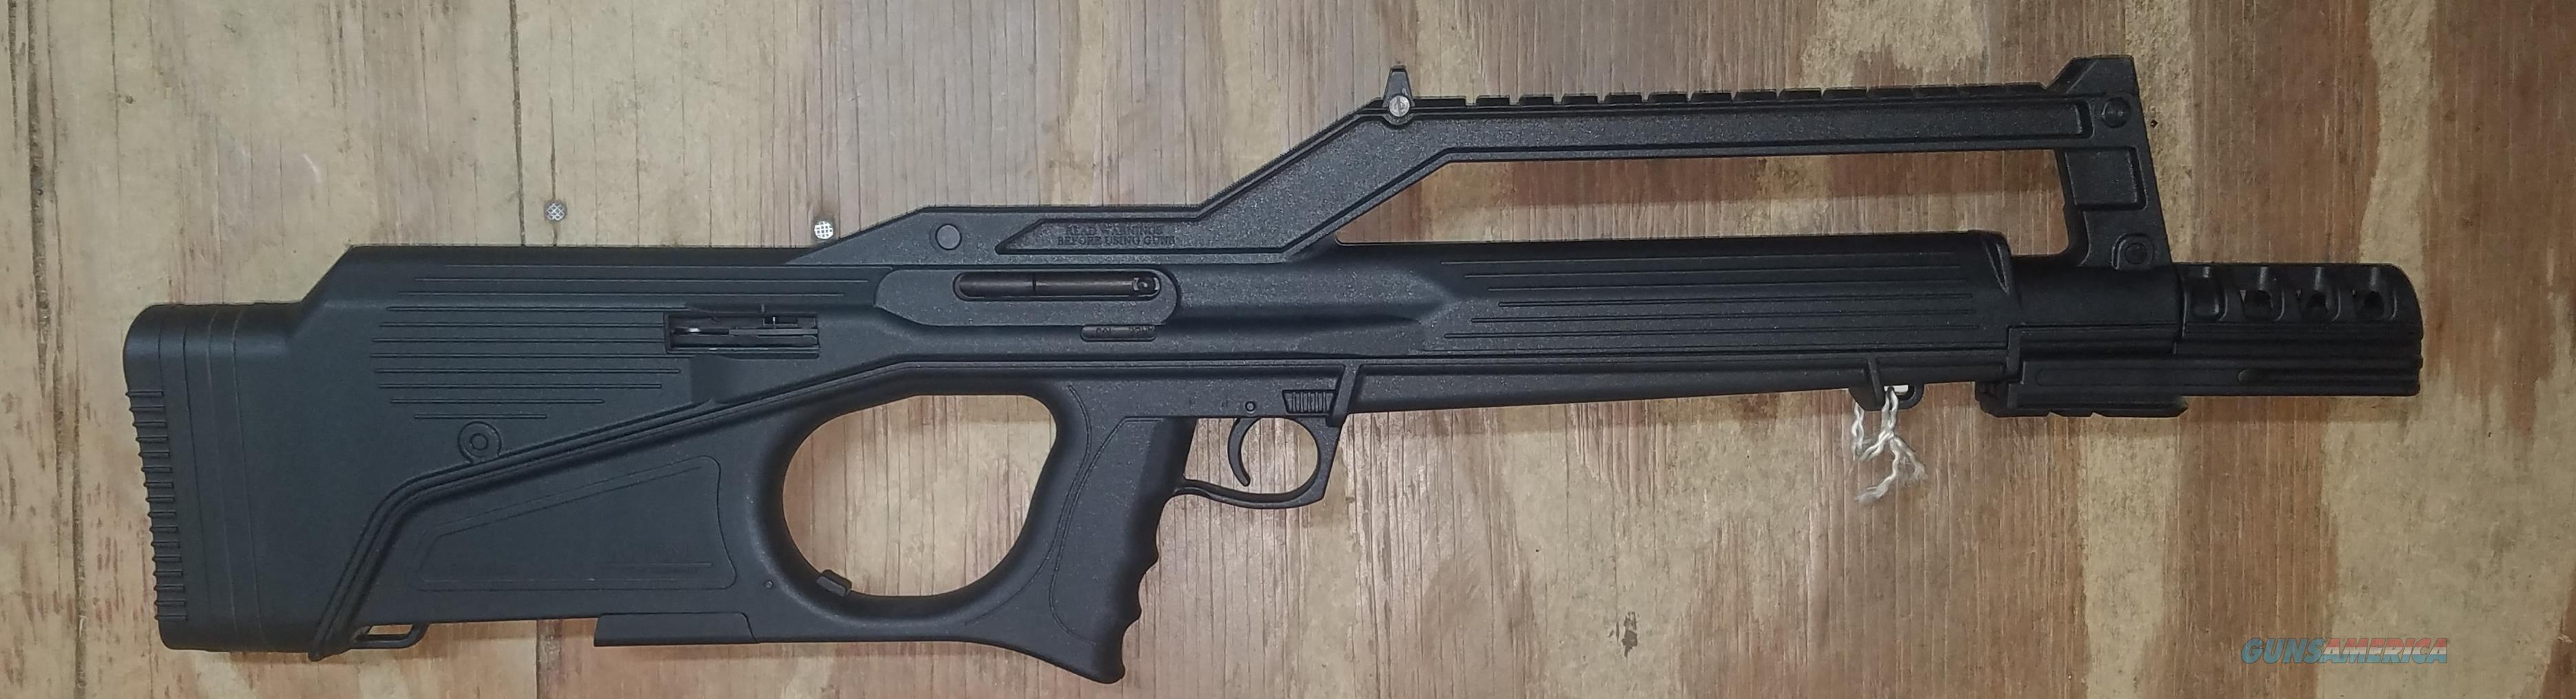 Tanfoglio Witness Appeal Bull Pup Design .22 WMR Rifle  Guns > Rifles > A Misc Rifles